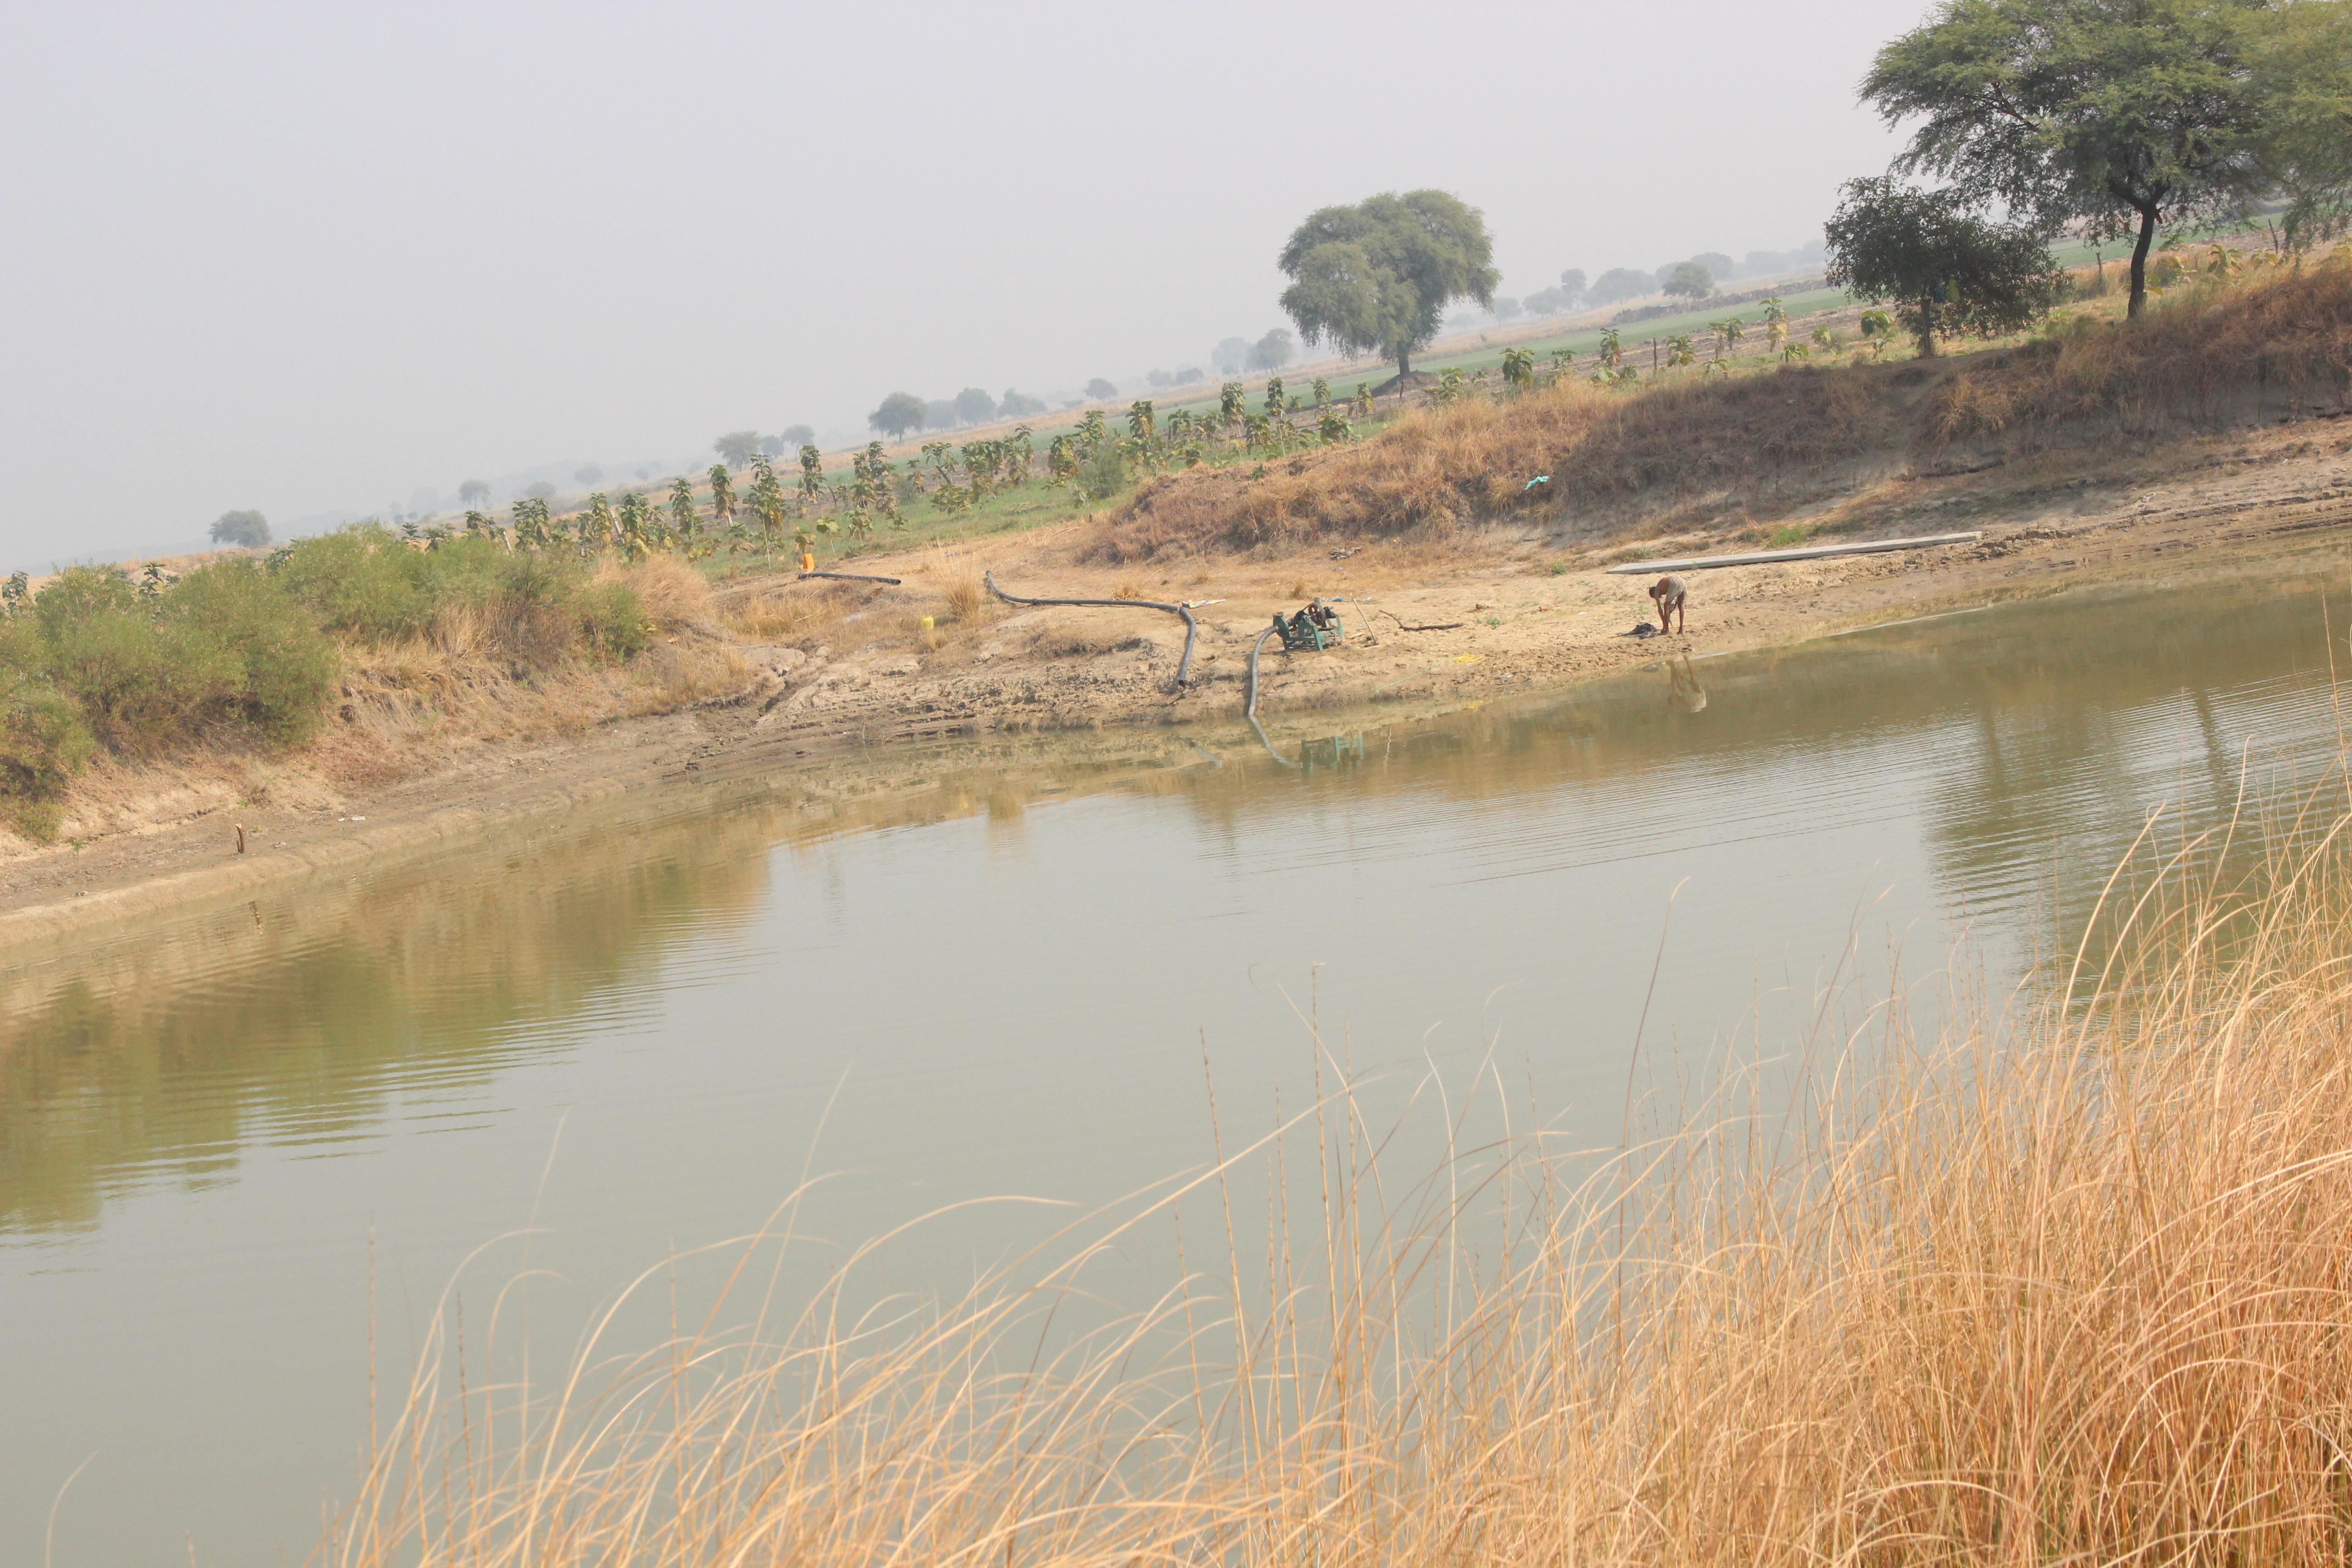 Jiganaura, Maudaha, Hamirpur